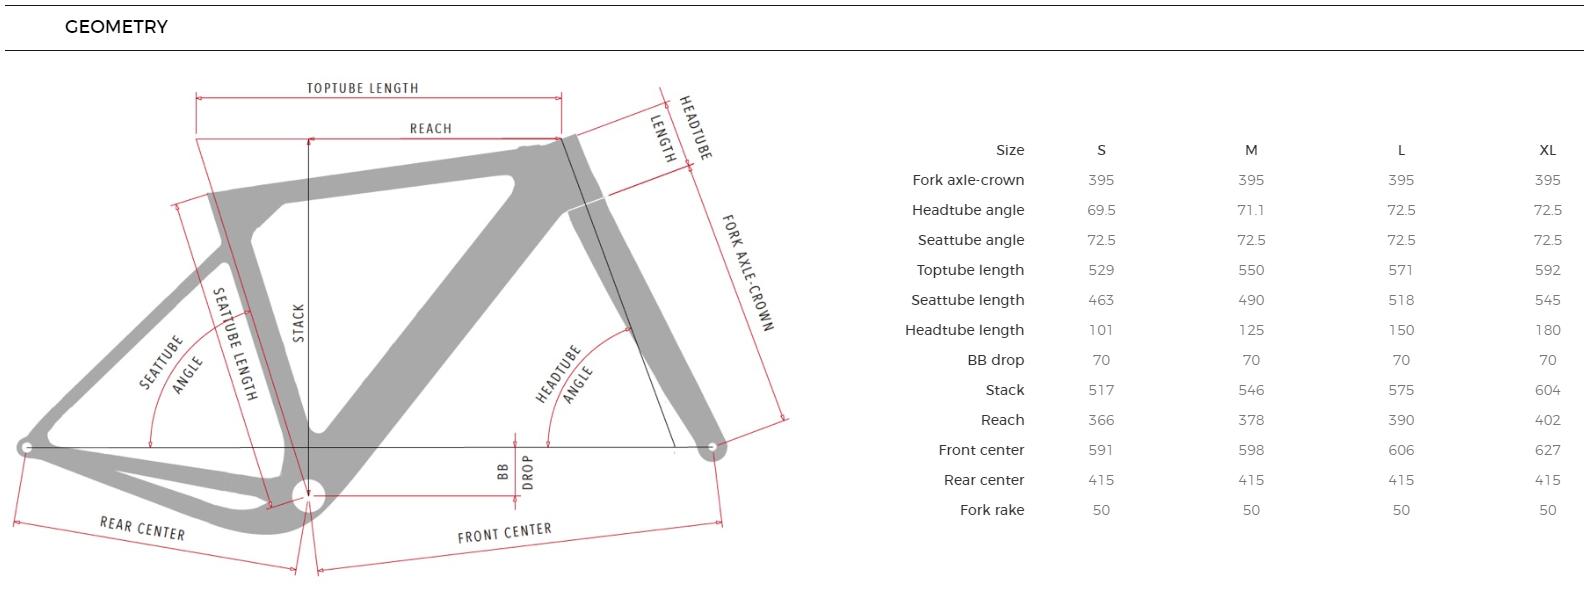 3T Exploro Flatmount geometry chart